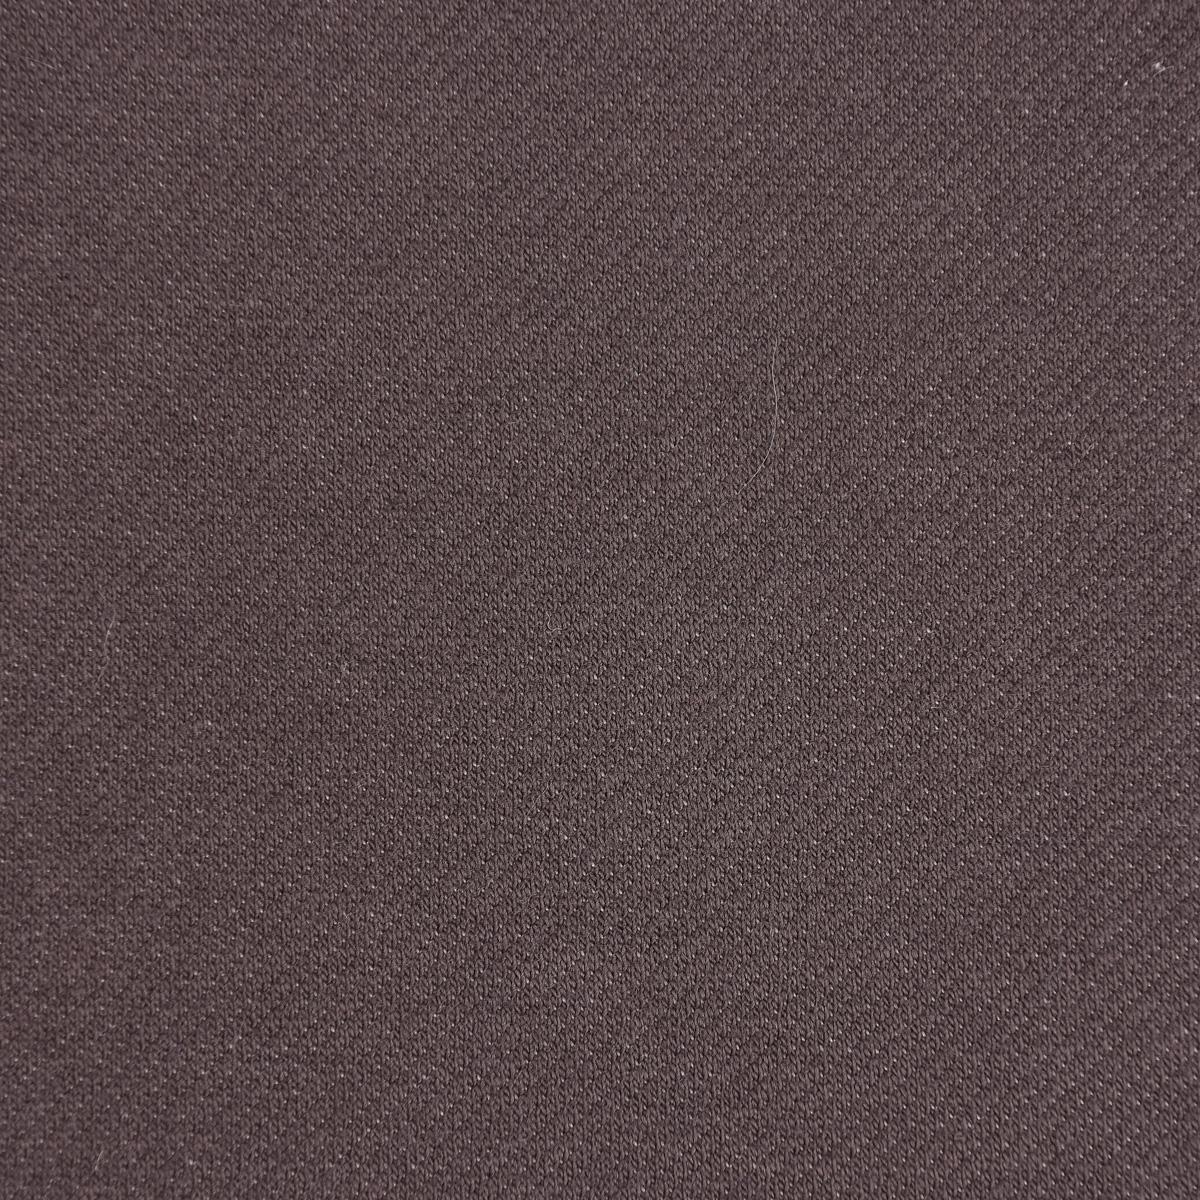 Baumwoll-Jeansstoff mit Elasthan Stretchjeans-Stoff weich einfarbig grau 1,5m Breite